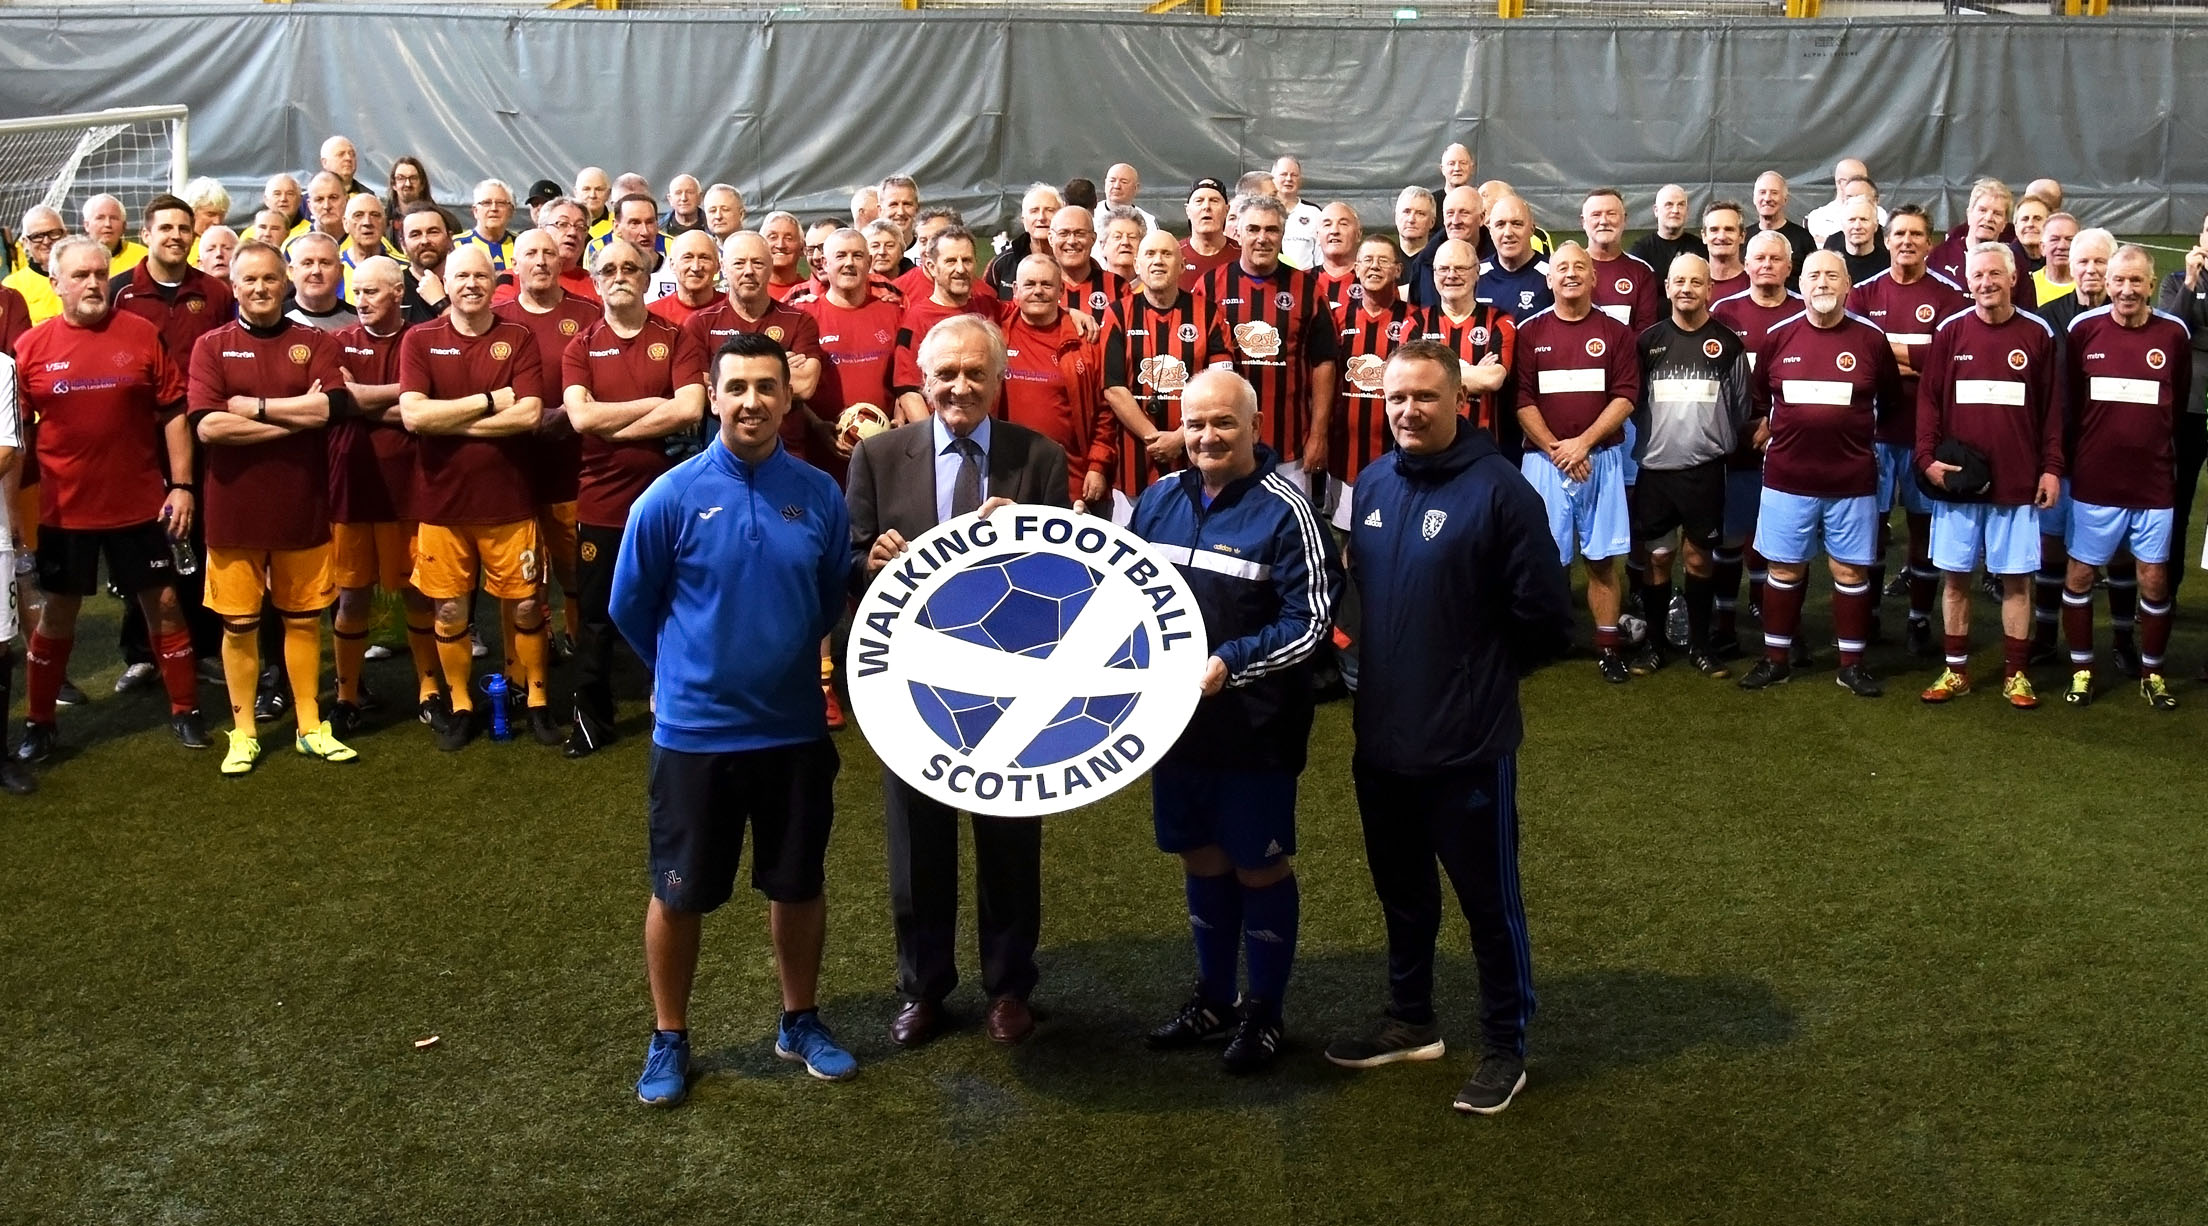 Front left: Scott Currie North Lanarkshire Leisure, Scottish football legend David Hay, Gary McLaughlin Chairman of Walking Football Scotland and Stevie Hamilton North Lanarkshire Leisure.